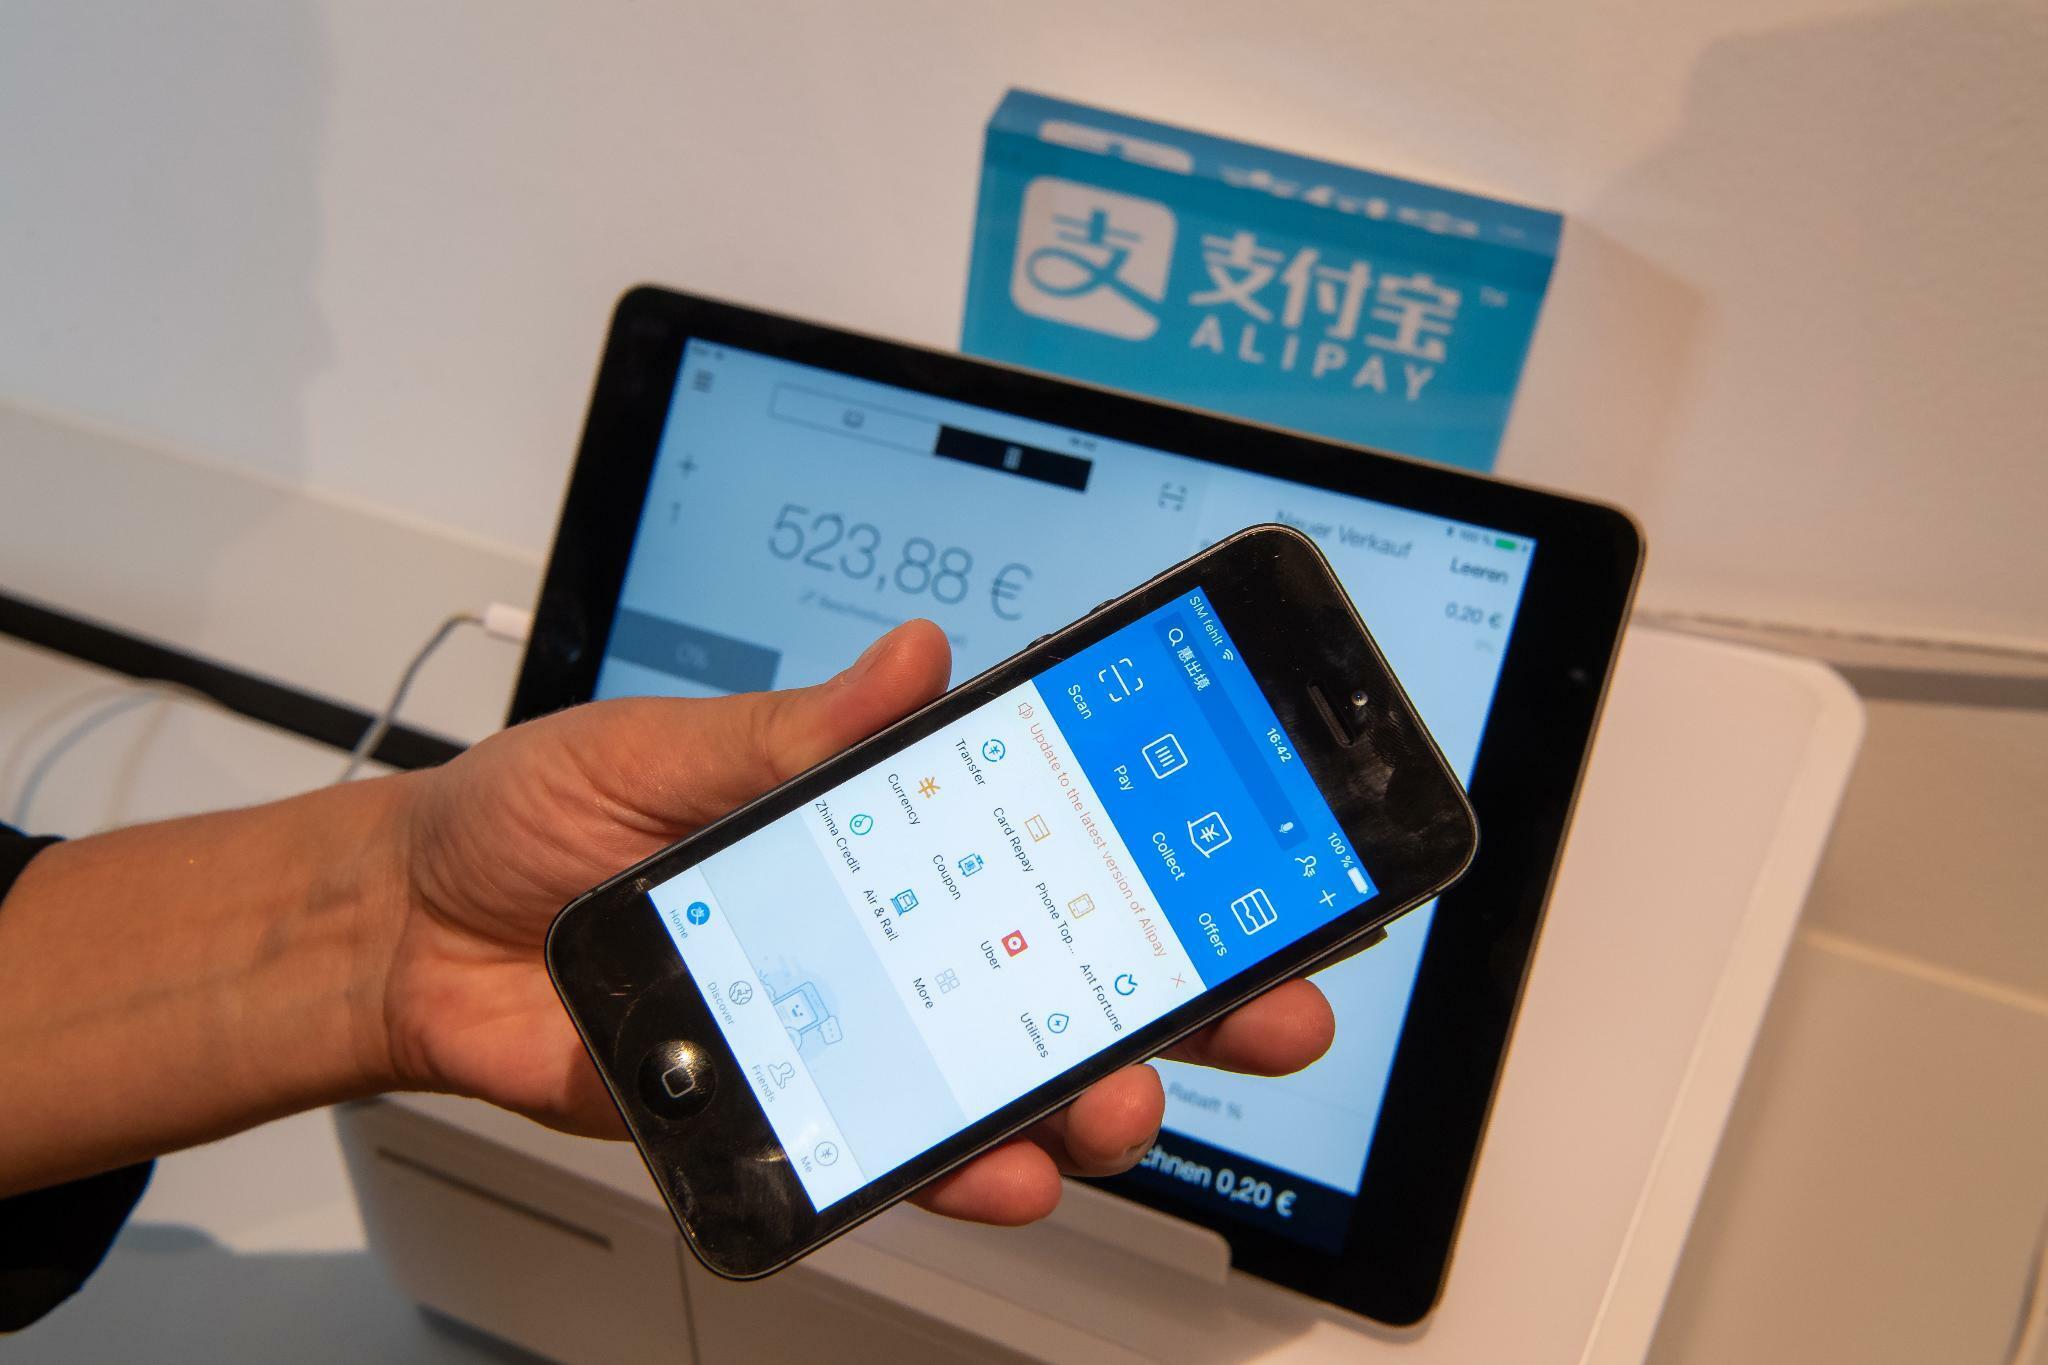 e2ab7c8b48ba3 App-Anbieter starten Initiative für mobiles Bezahlen in Europa